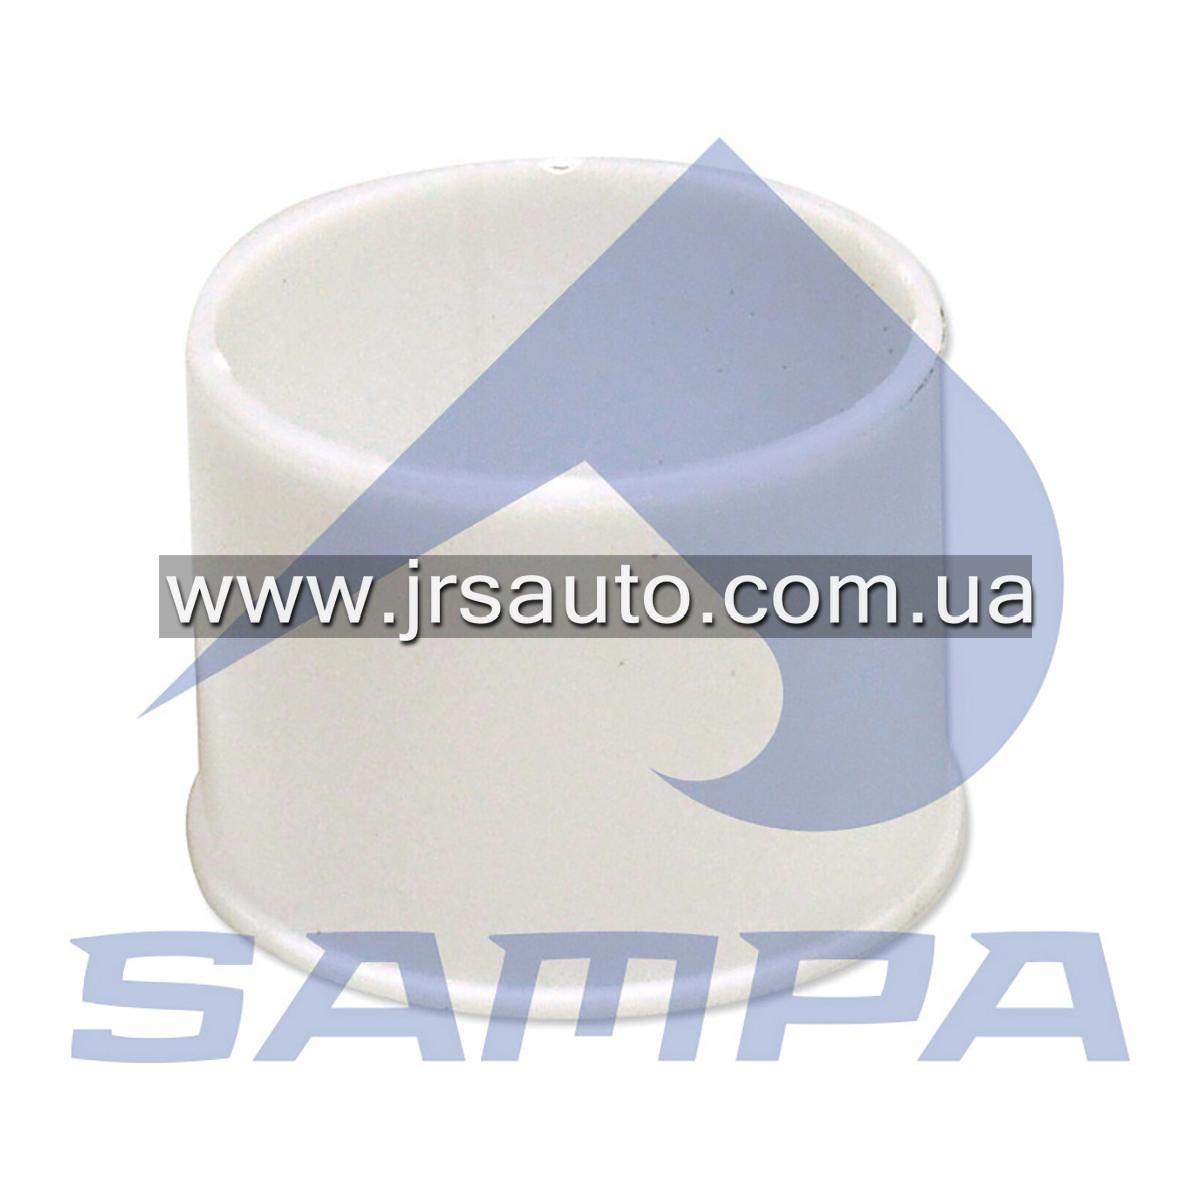 Втулка редуктора пластиковая d60xD65x50.5 Renault VOLVO \3173775 \ 015.074